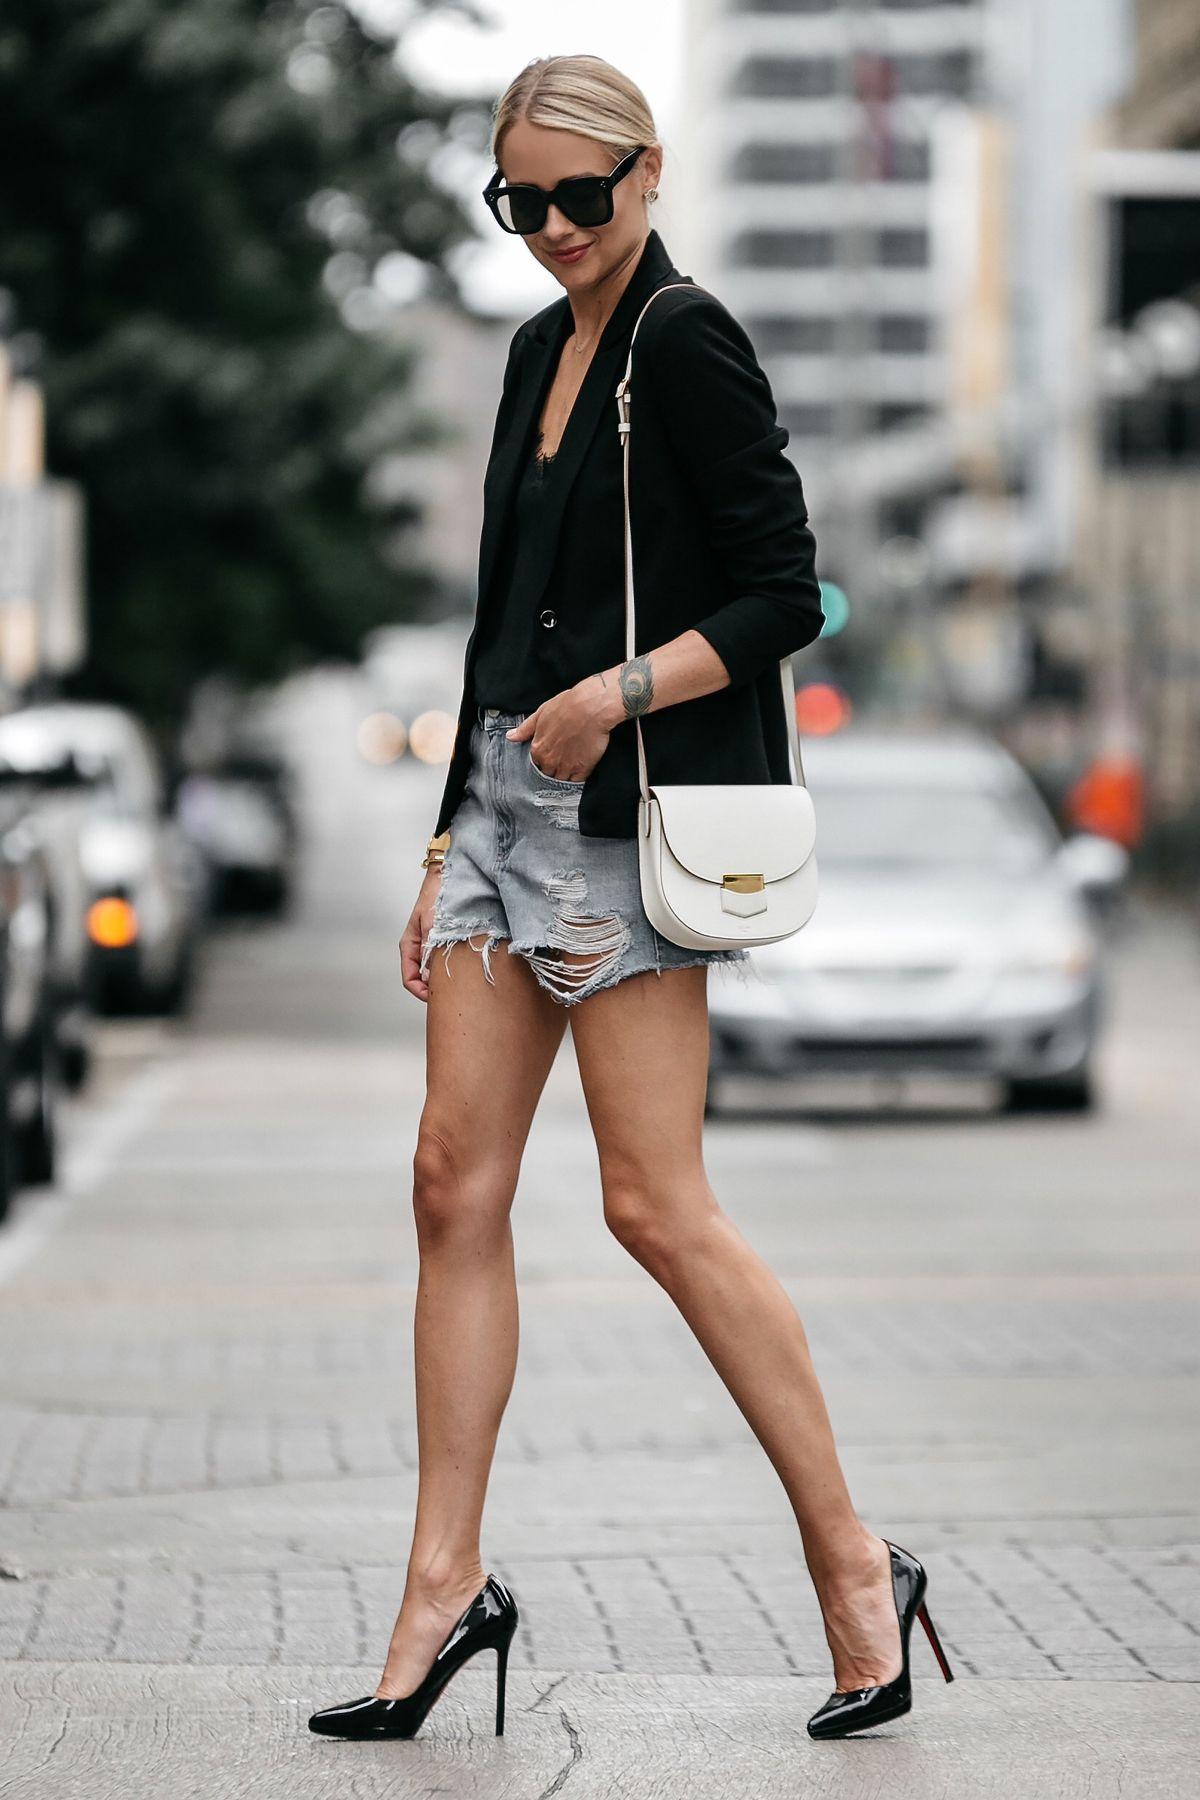 b2ac5b21e352 Blonde Woman Wearing Nordstrom Black Blazer Topshop Denim Cutoff Shorts  Outfit Christian Louboutin Black Pumps Celine White Trotteur Handbag Street  Style ...